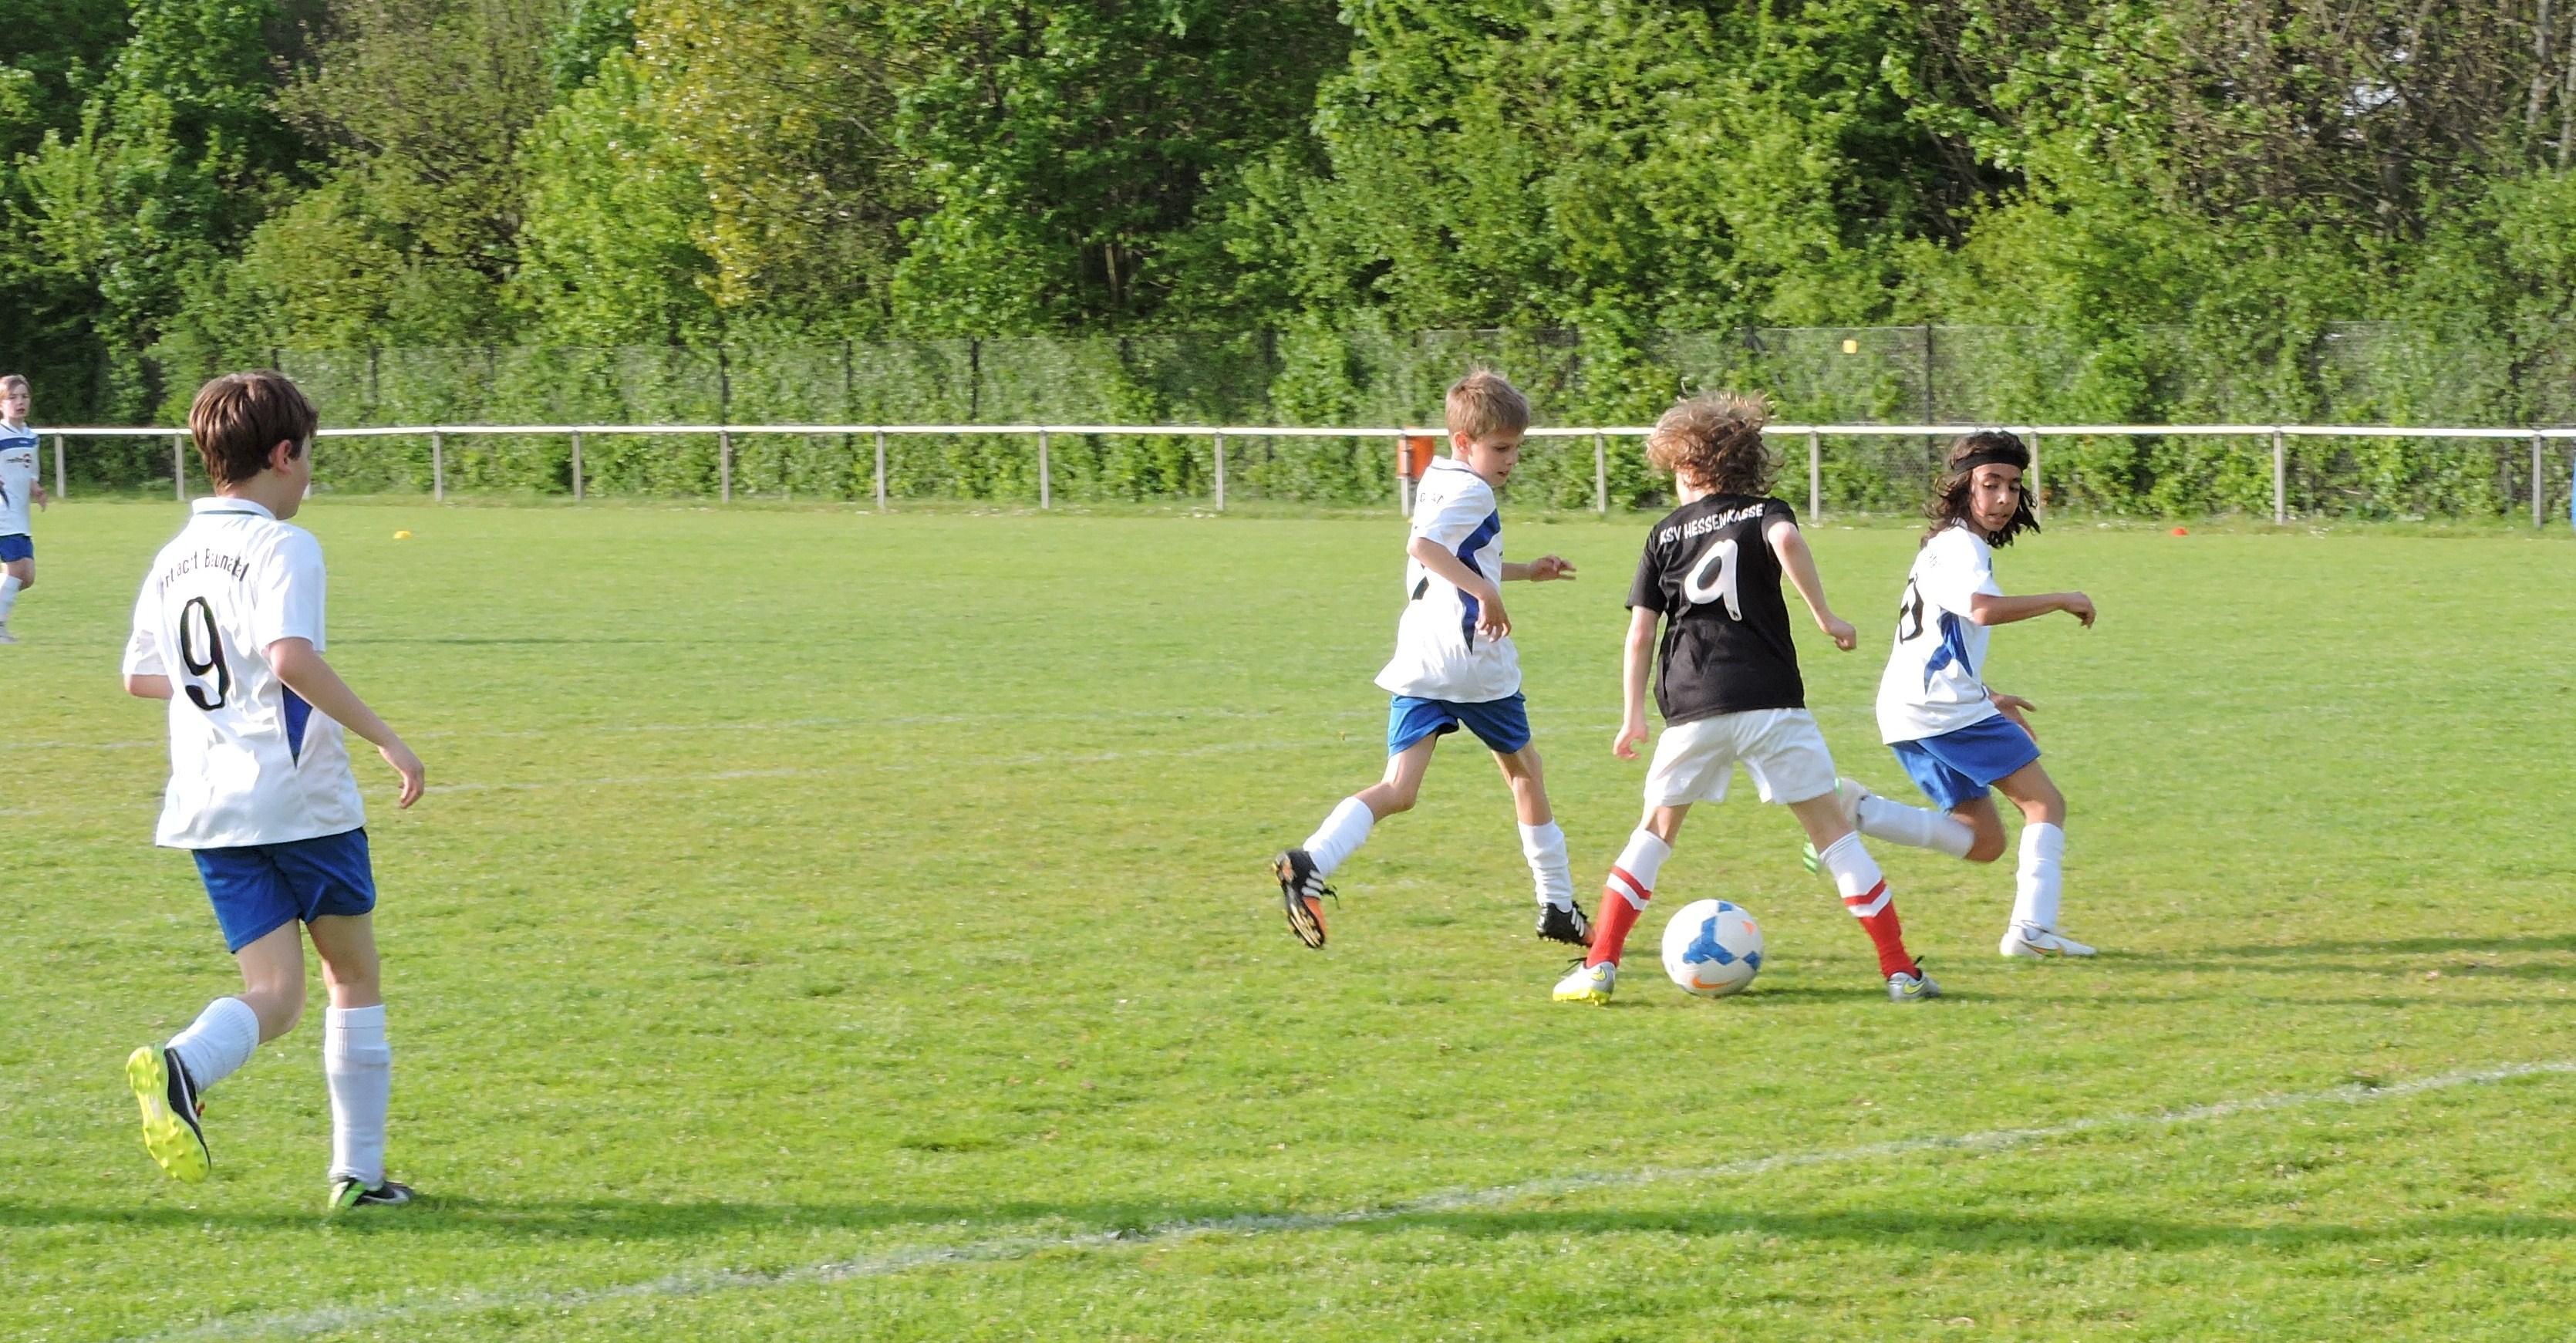 U11 - Eintracht Baunatal (Halbfinale Pokal / Mai 2015)